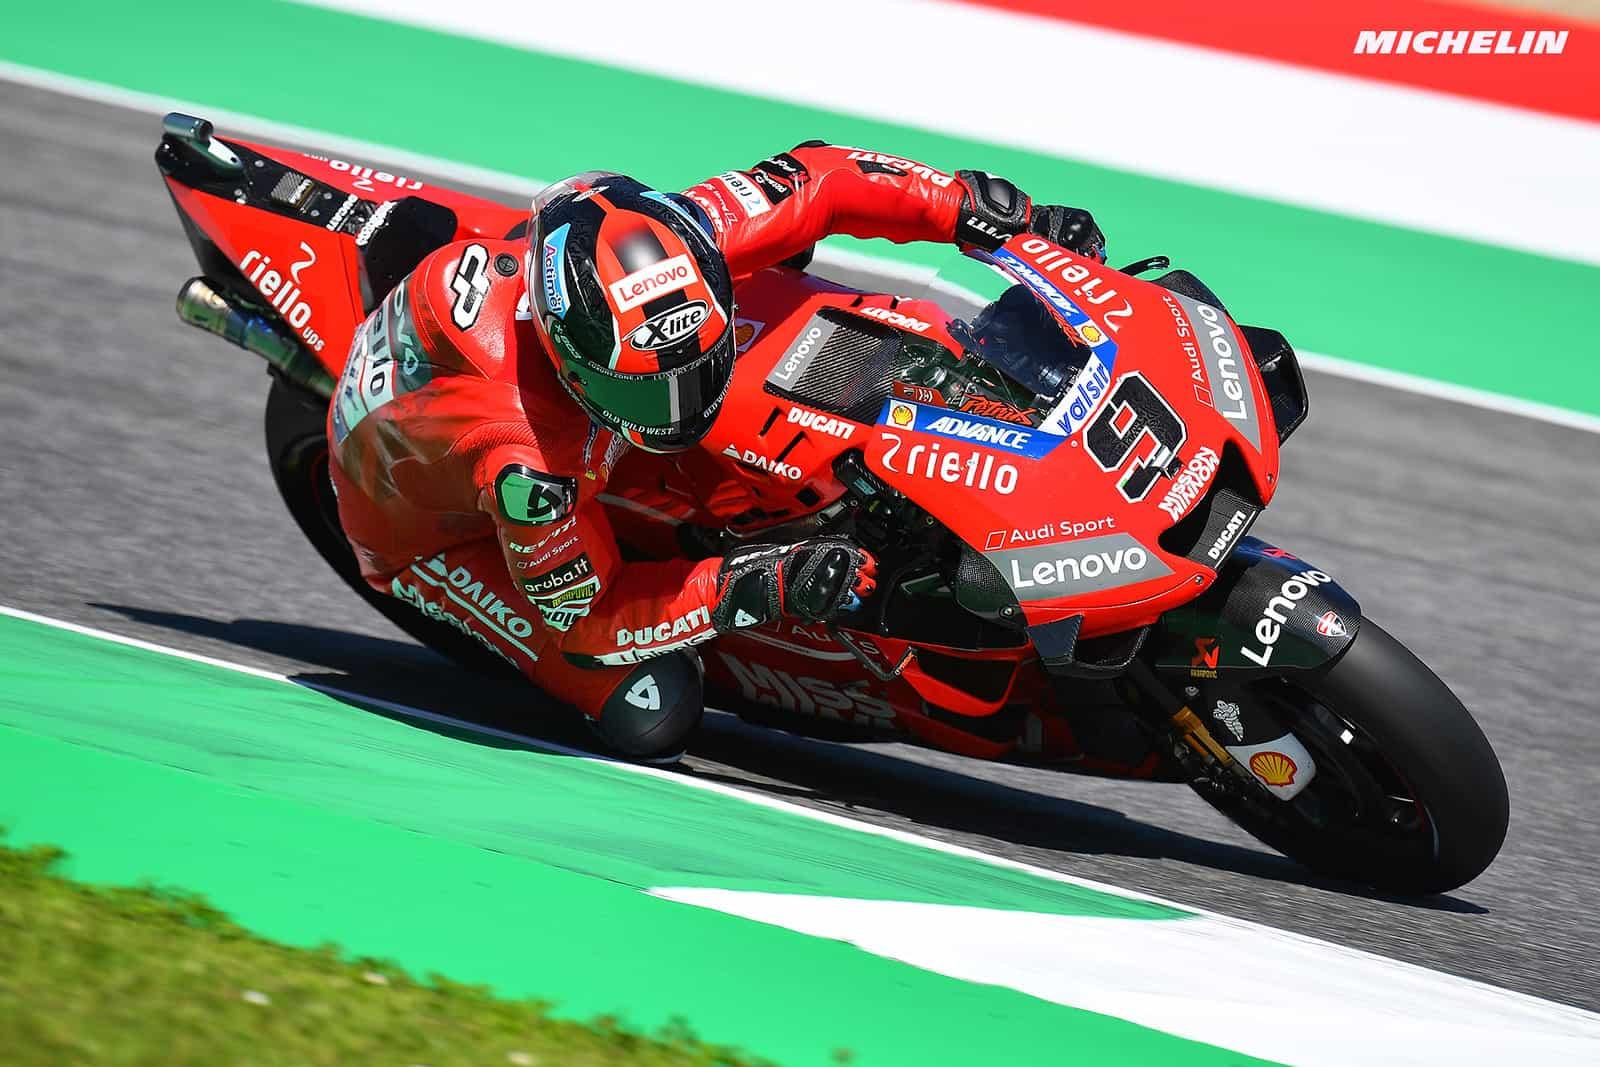 MotoGP2019イタリアGP ペトルッチ「目標はポールポジション」